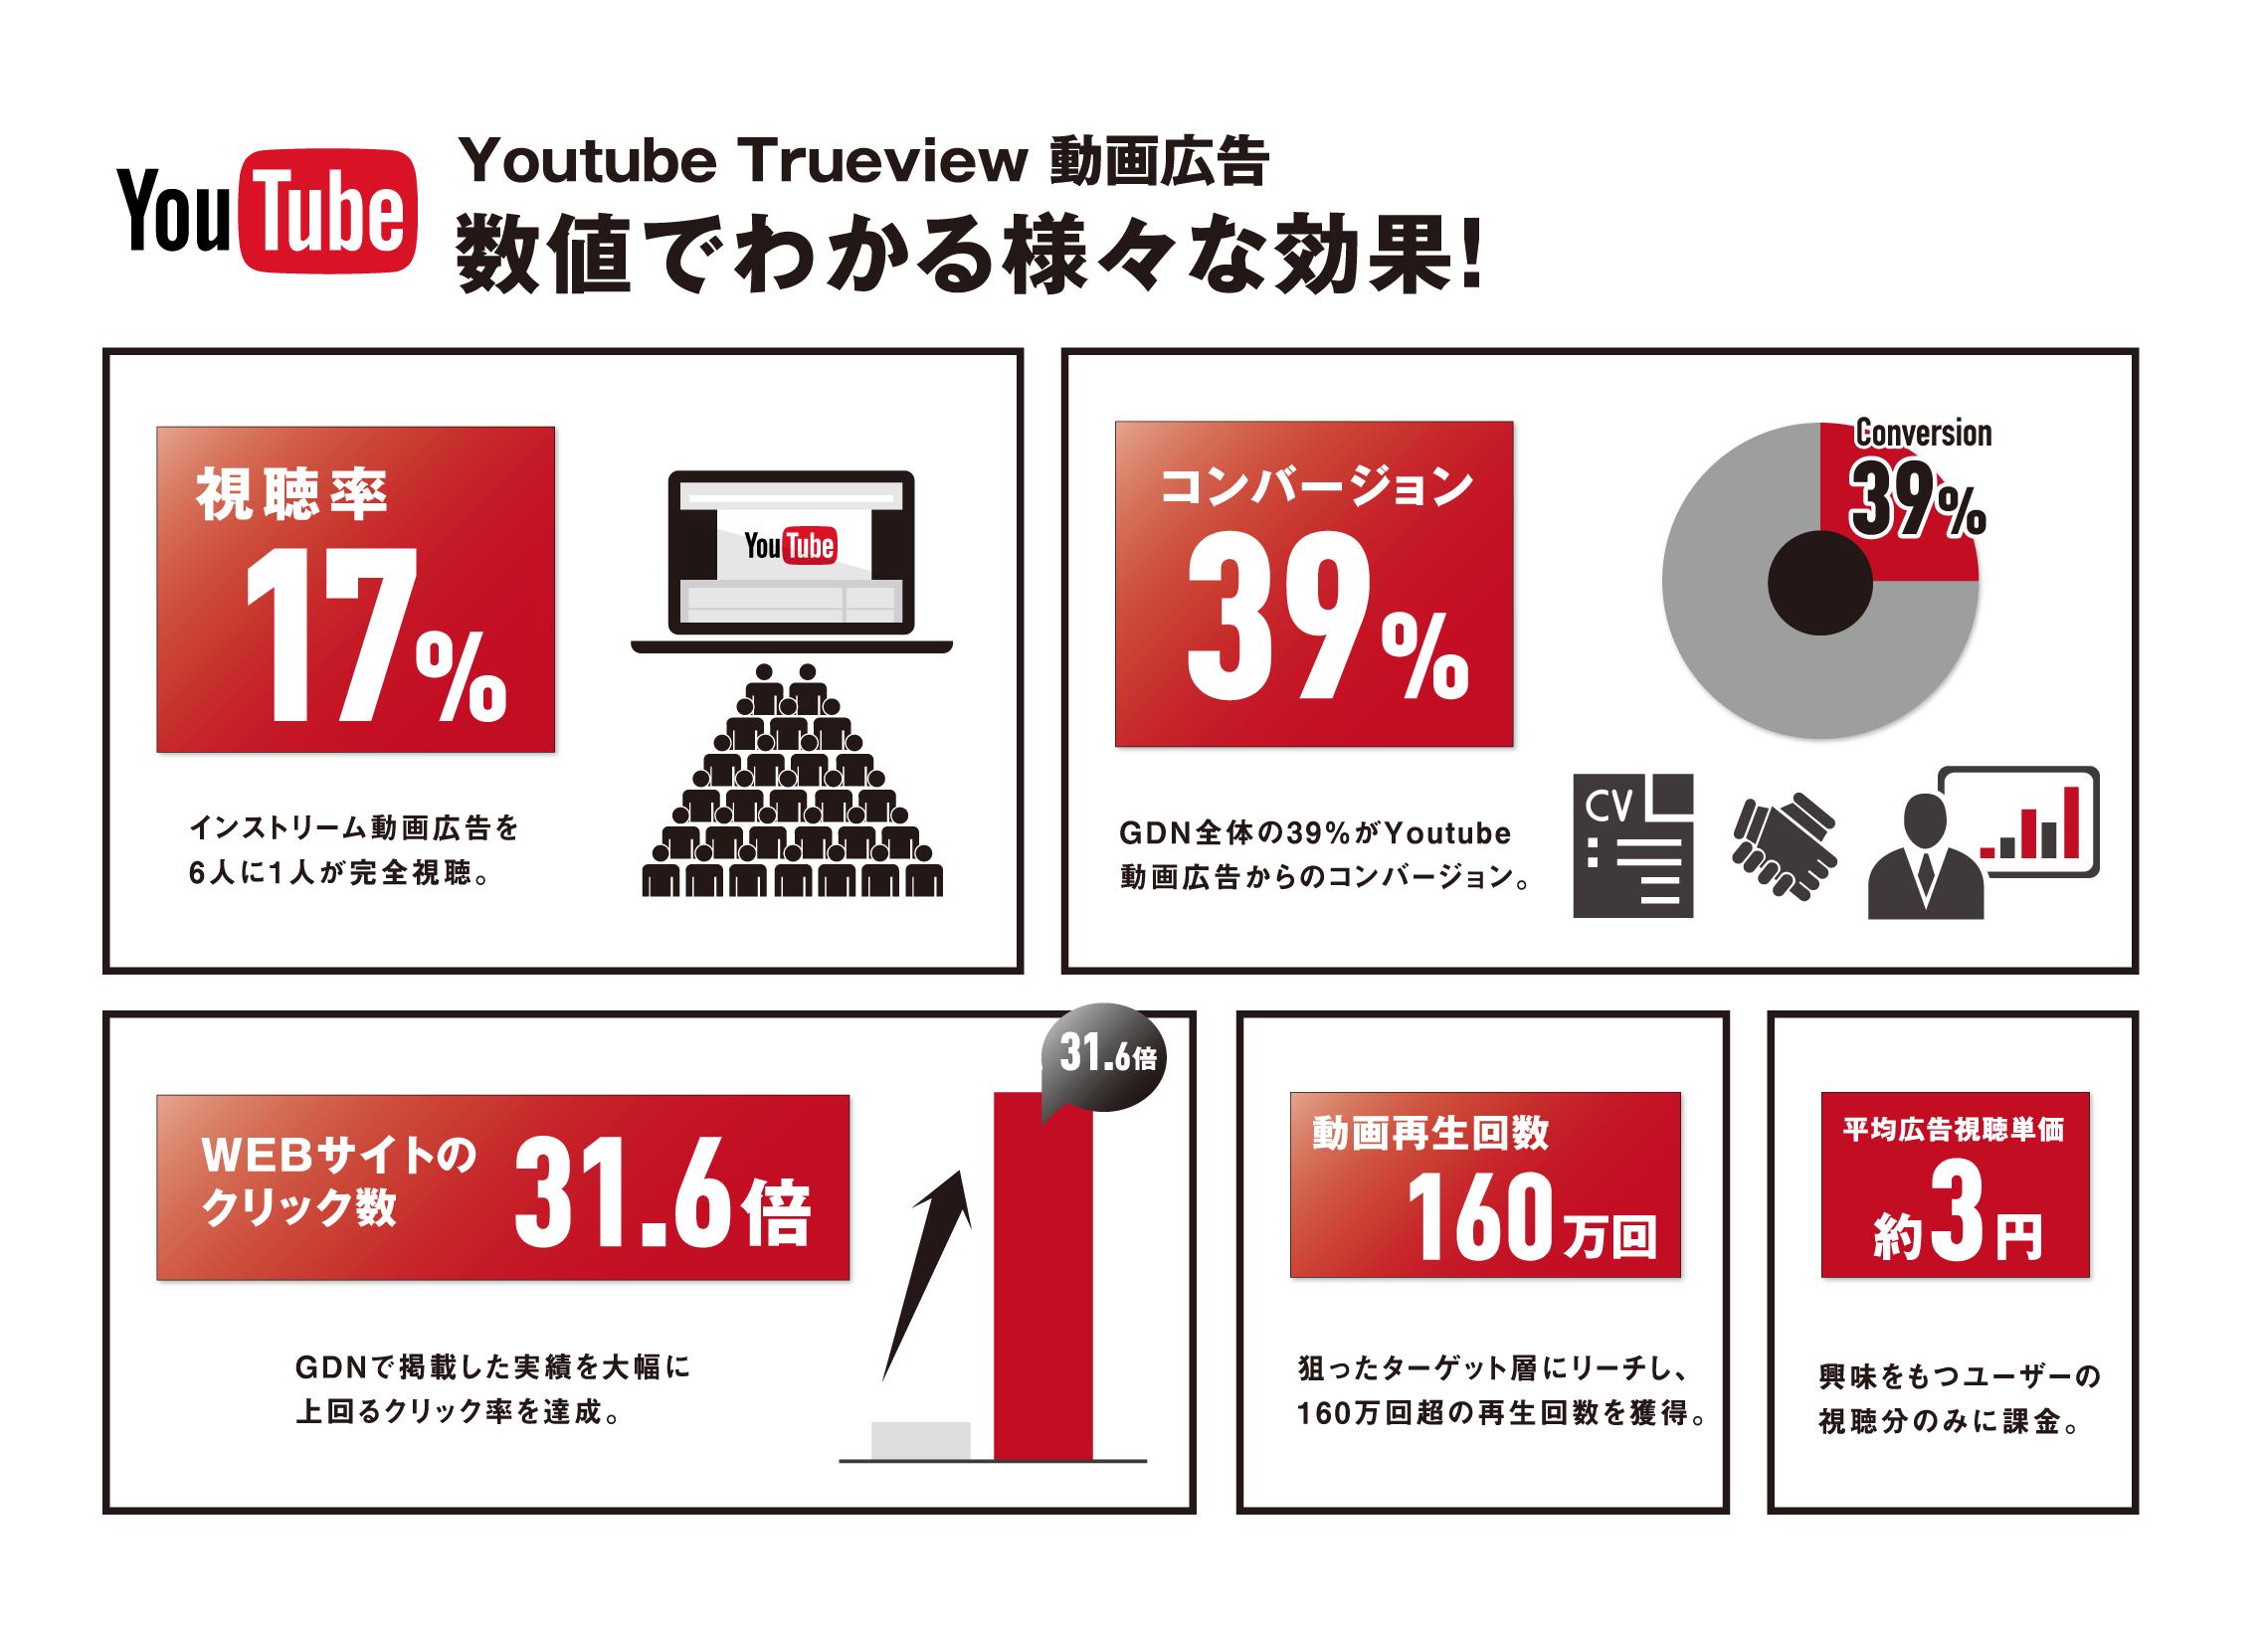 Youtube Trueview 広告 コンバージョン数値